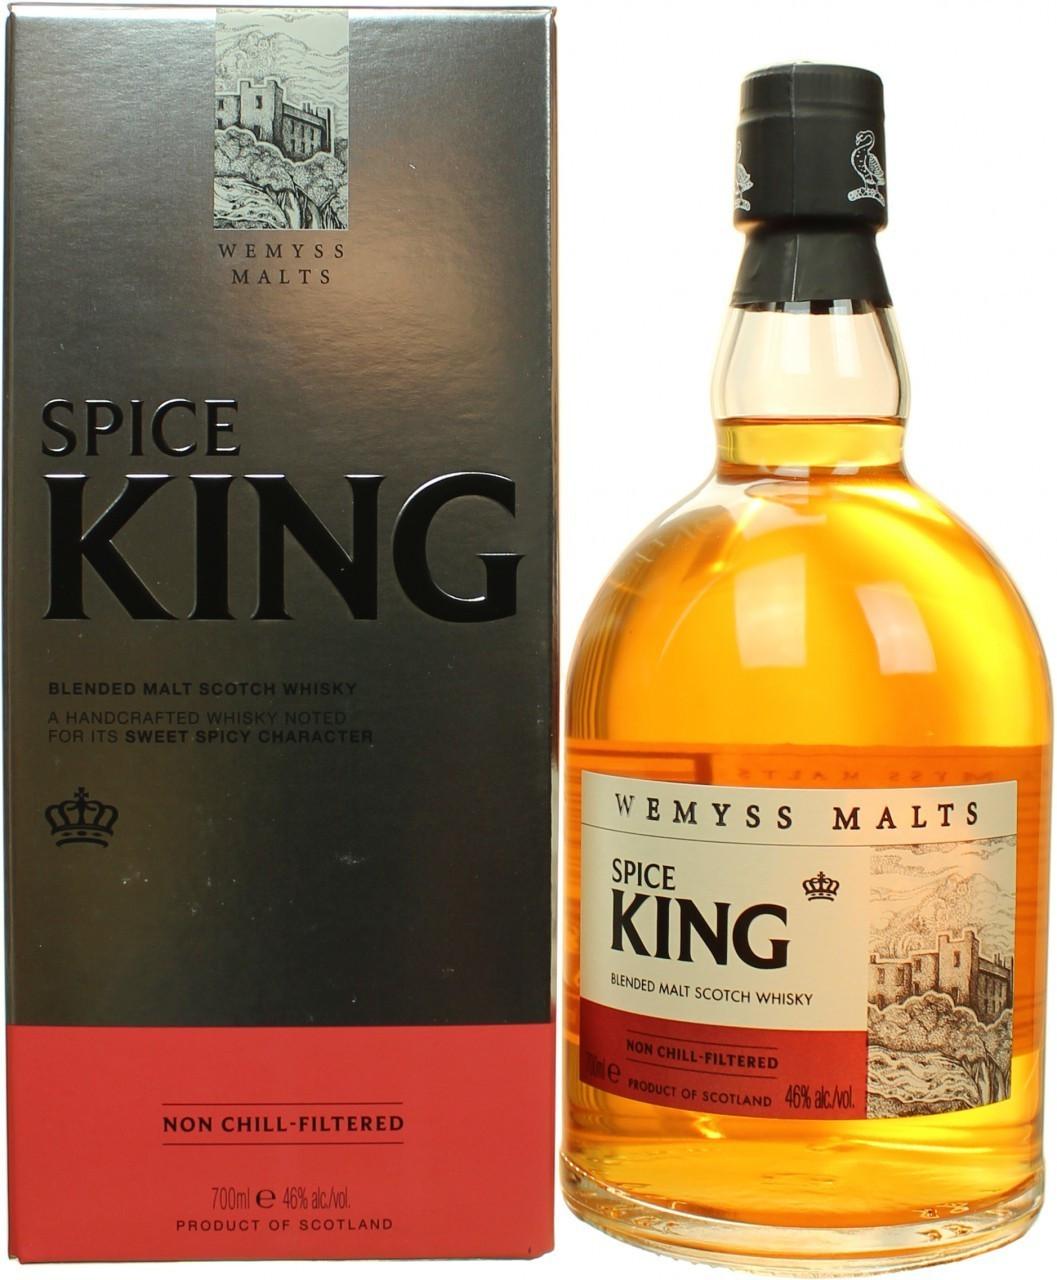 Wemyss Malts Spice King 46.0% 0,7l